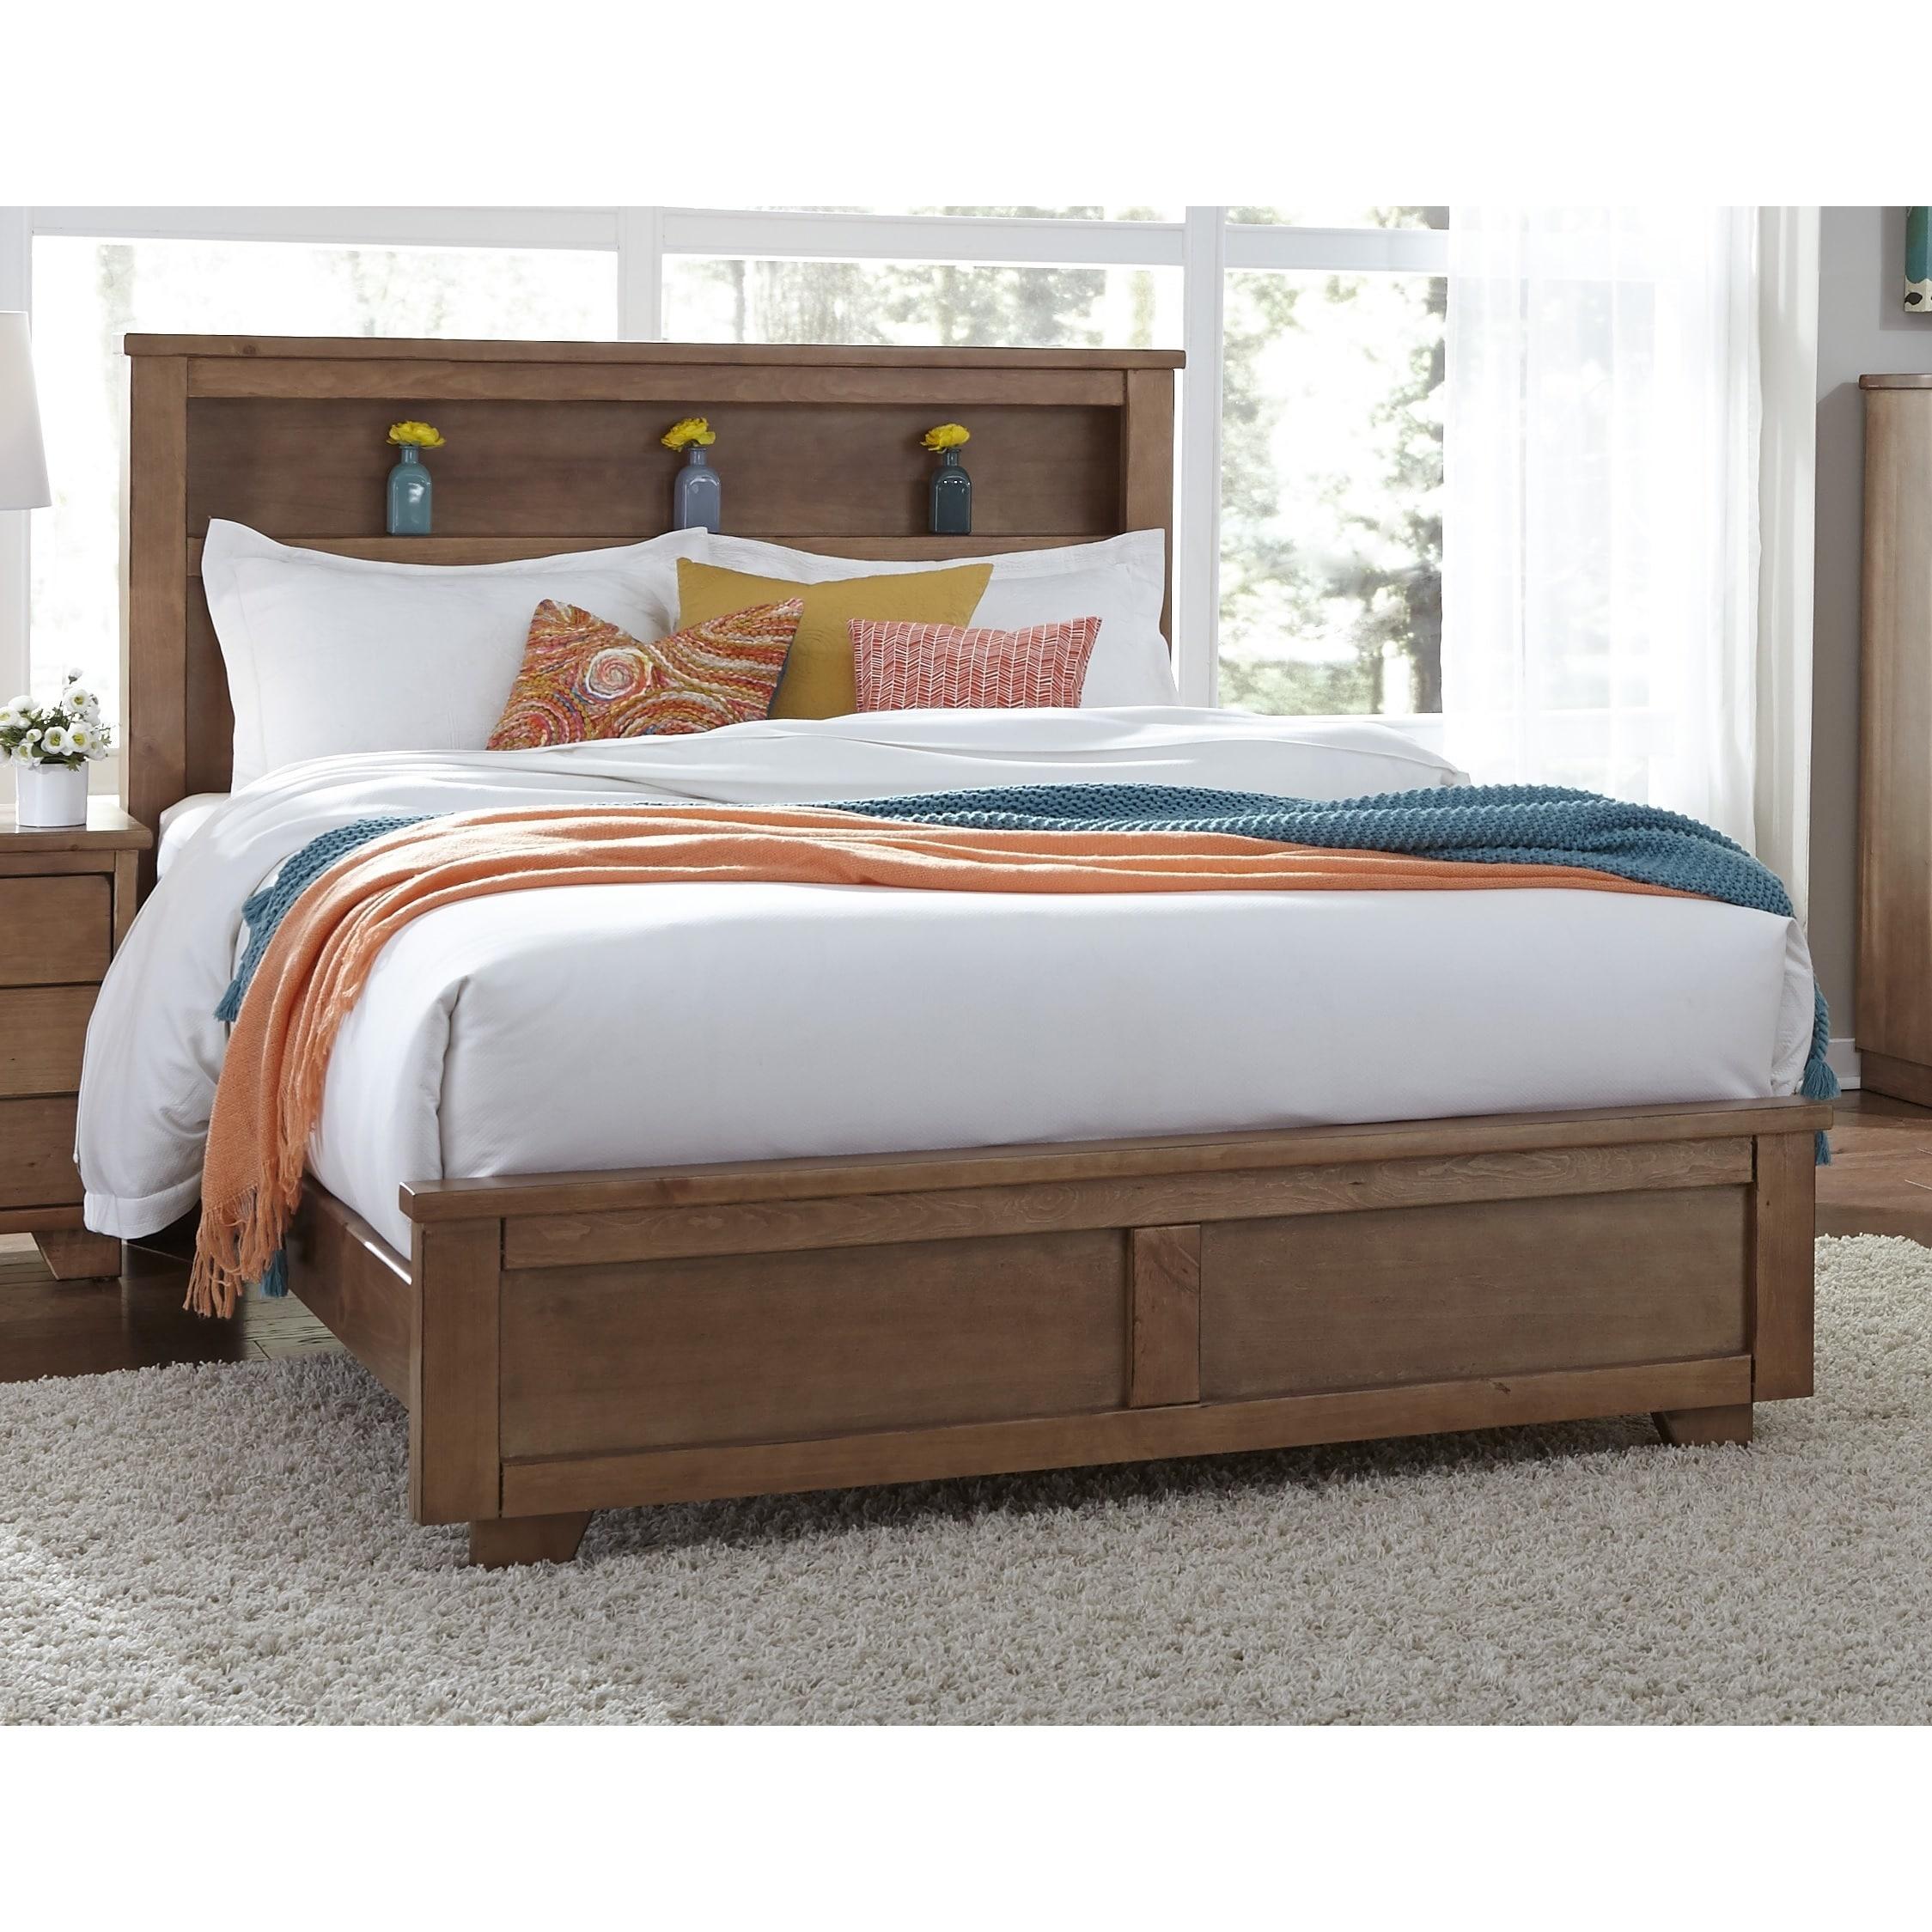 Progressive International Diego Bookcase Complete Bed (Ki...